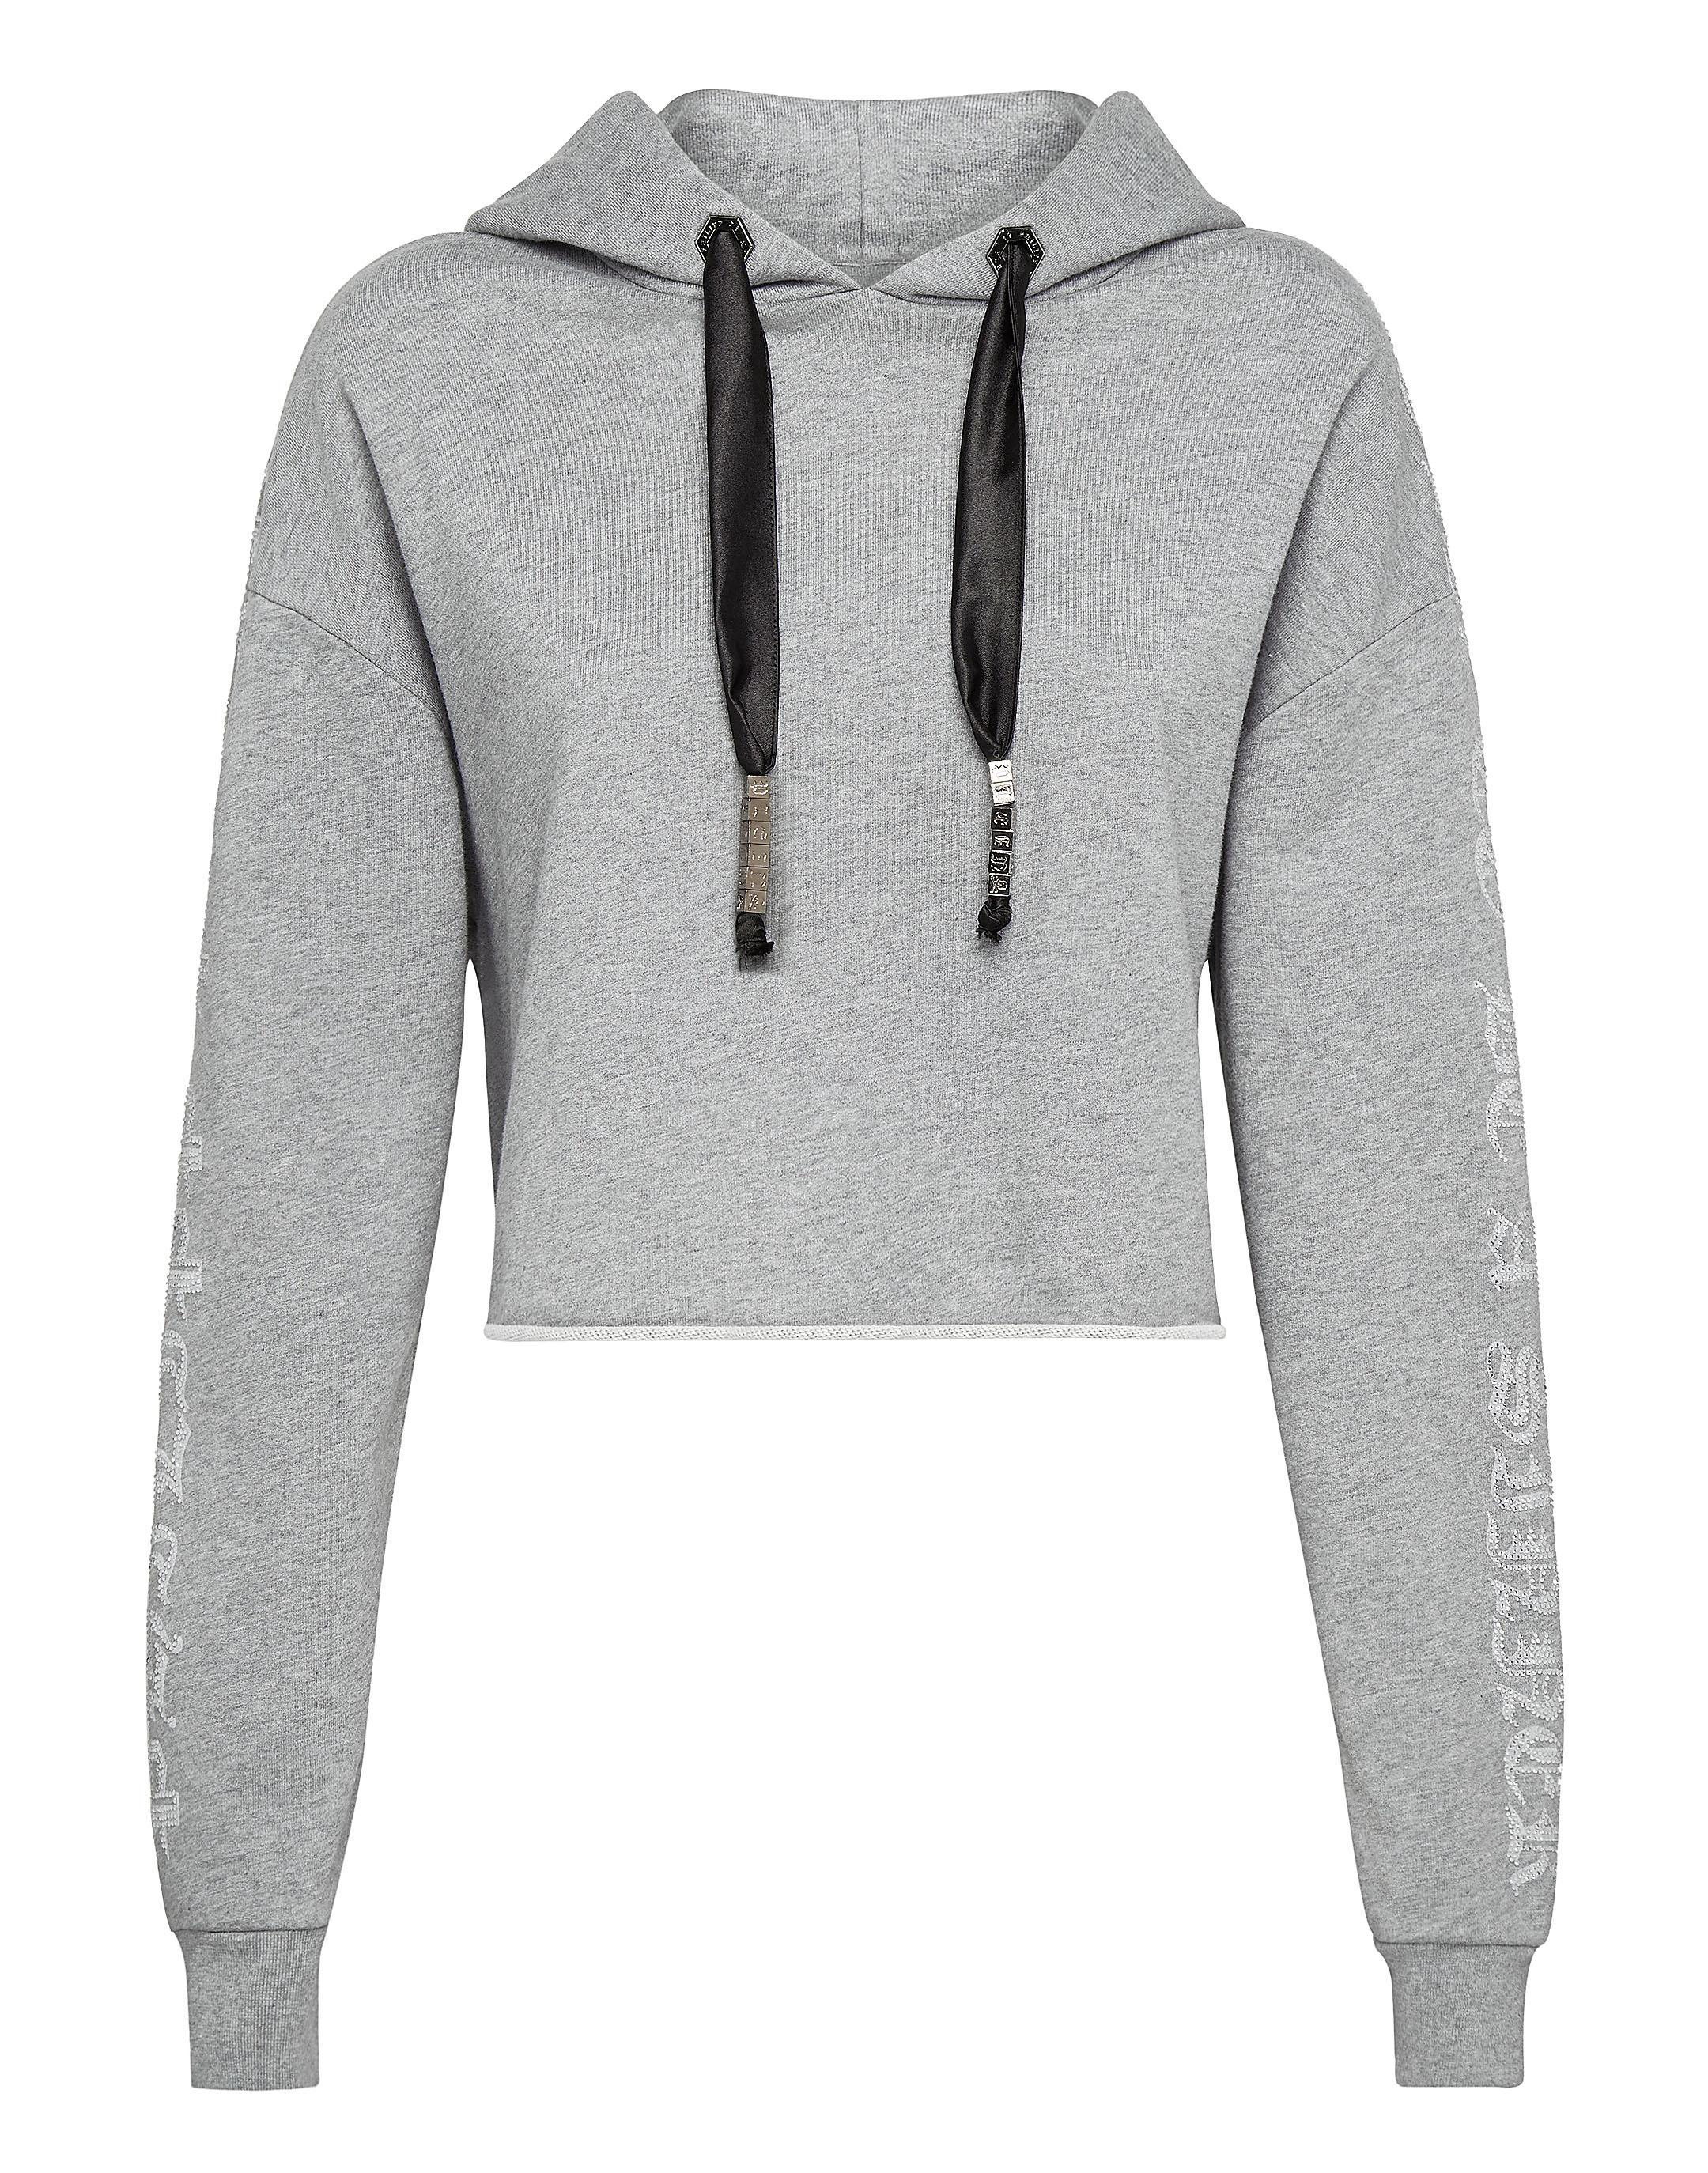 b162995553b Philipp Plein Hoodie Sweatshirt Crystal Plein